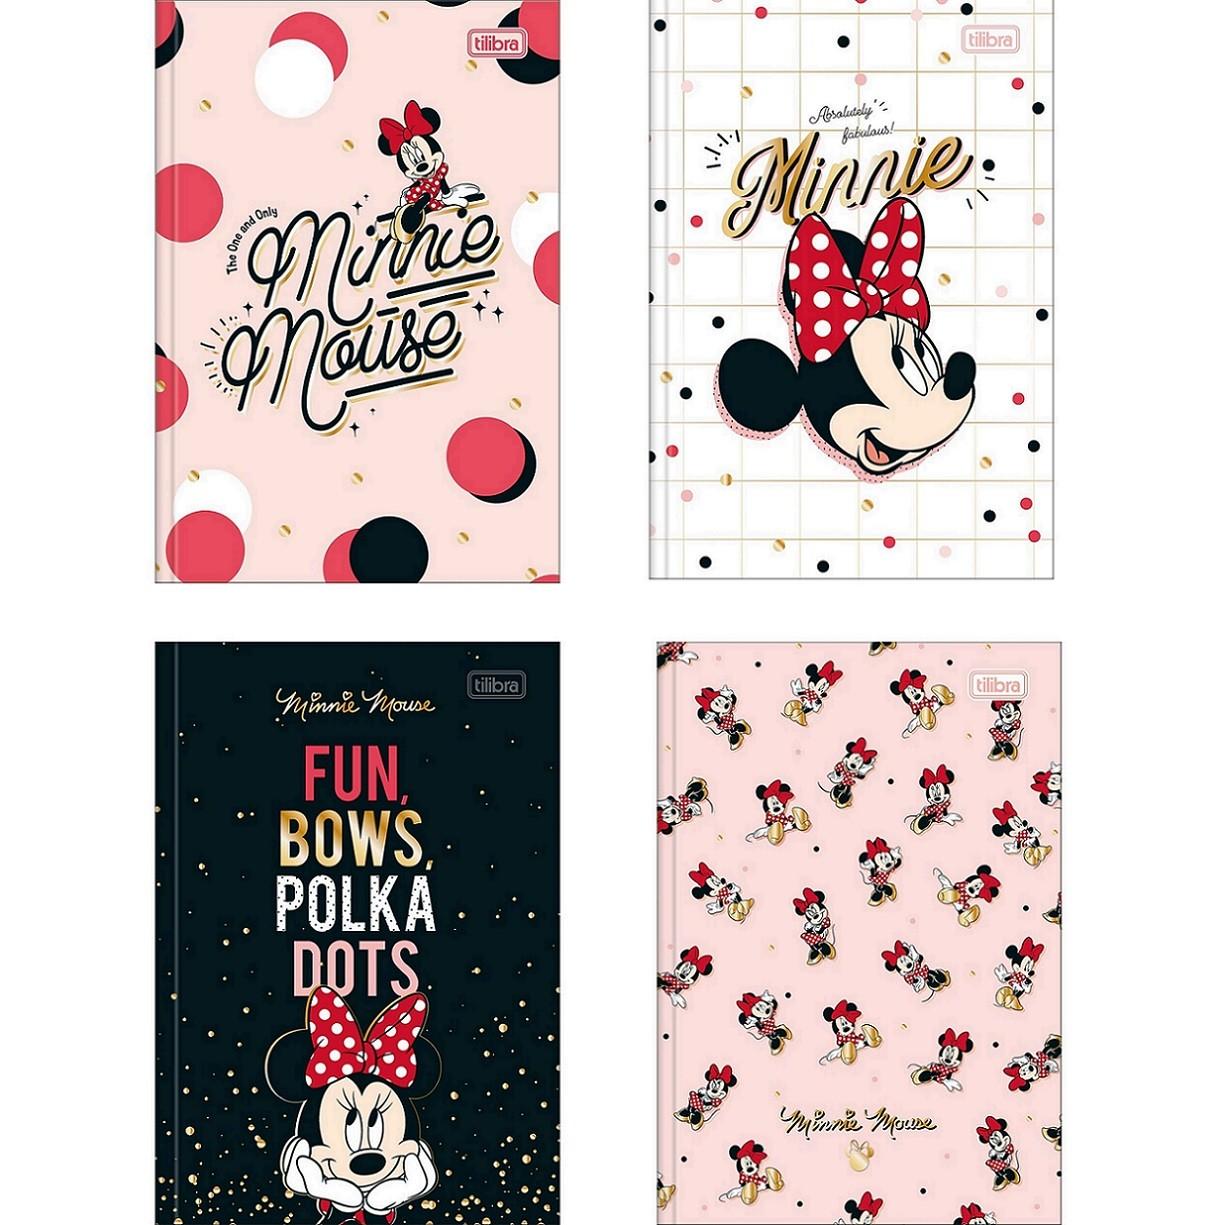 Caderno Brochura Capa Dura 1/4 Minnie Mouse 80 Fls Tilibra